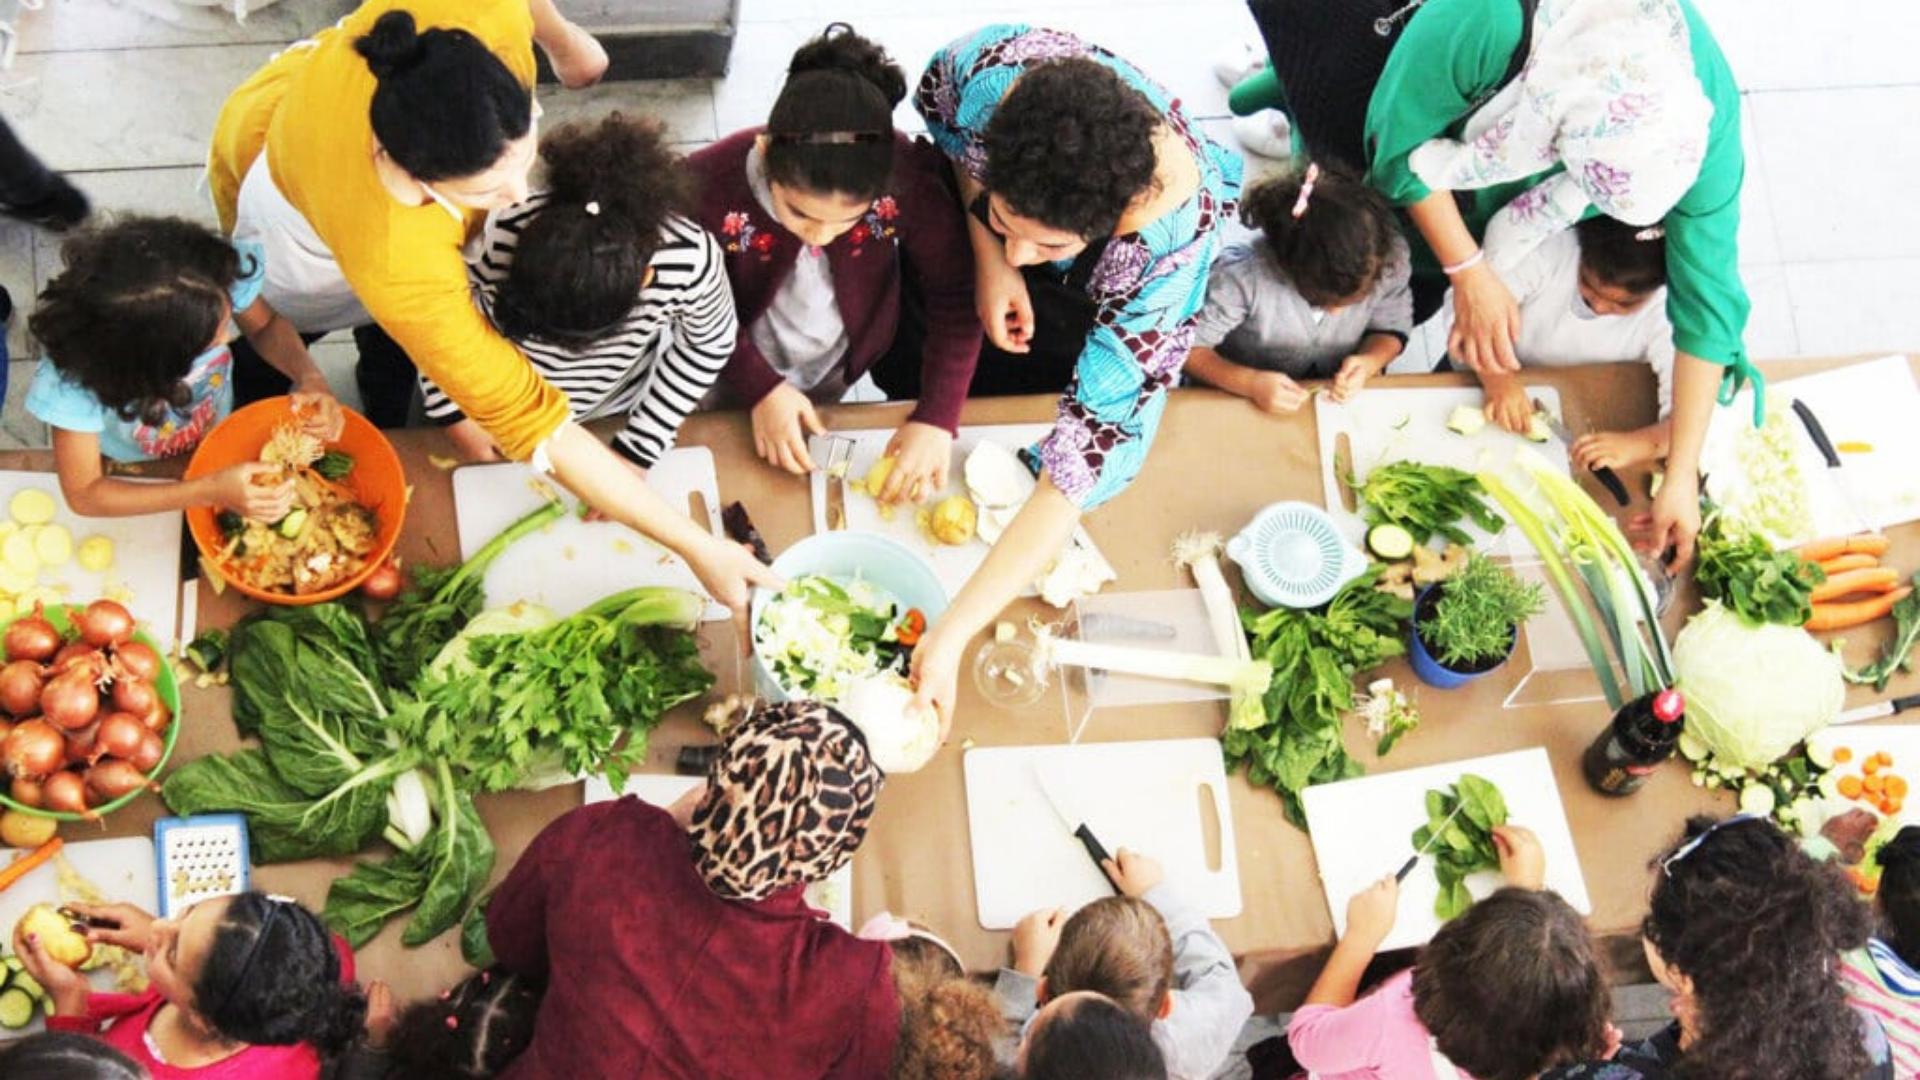 Perché è fondamentale costruire comunità di cura